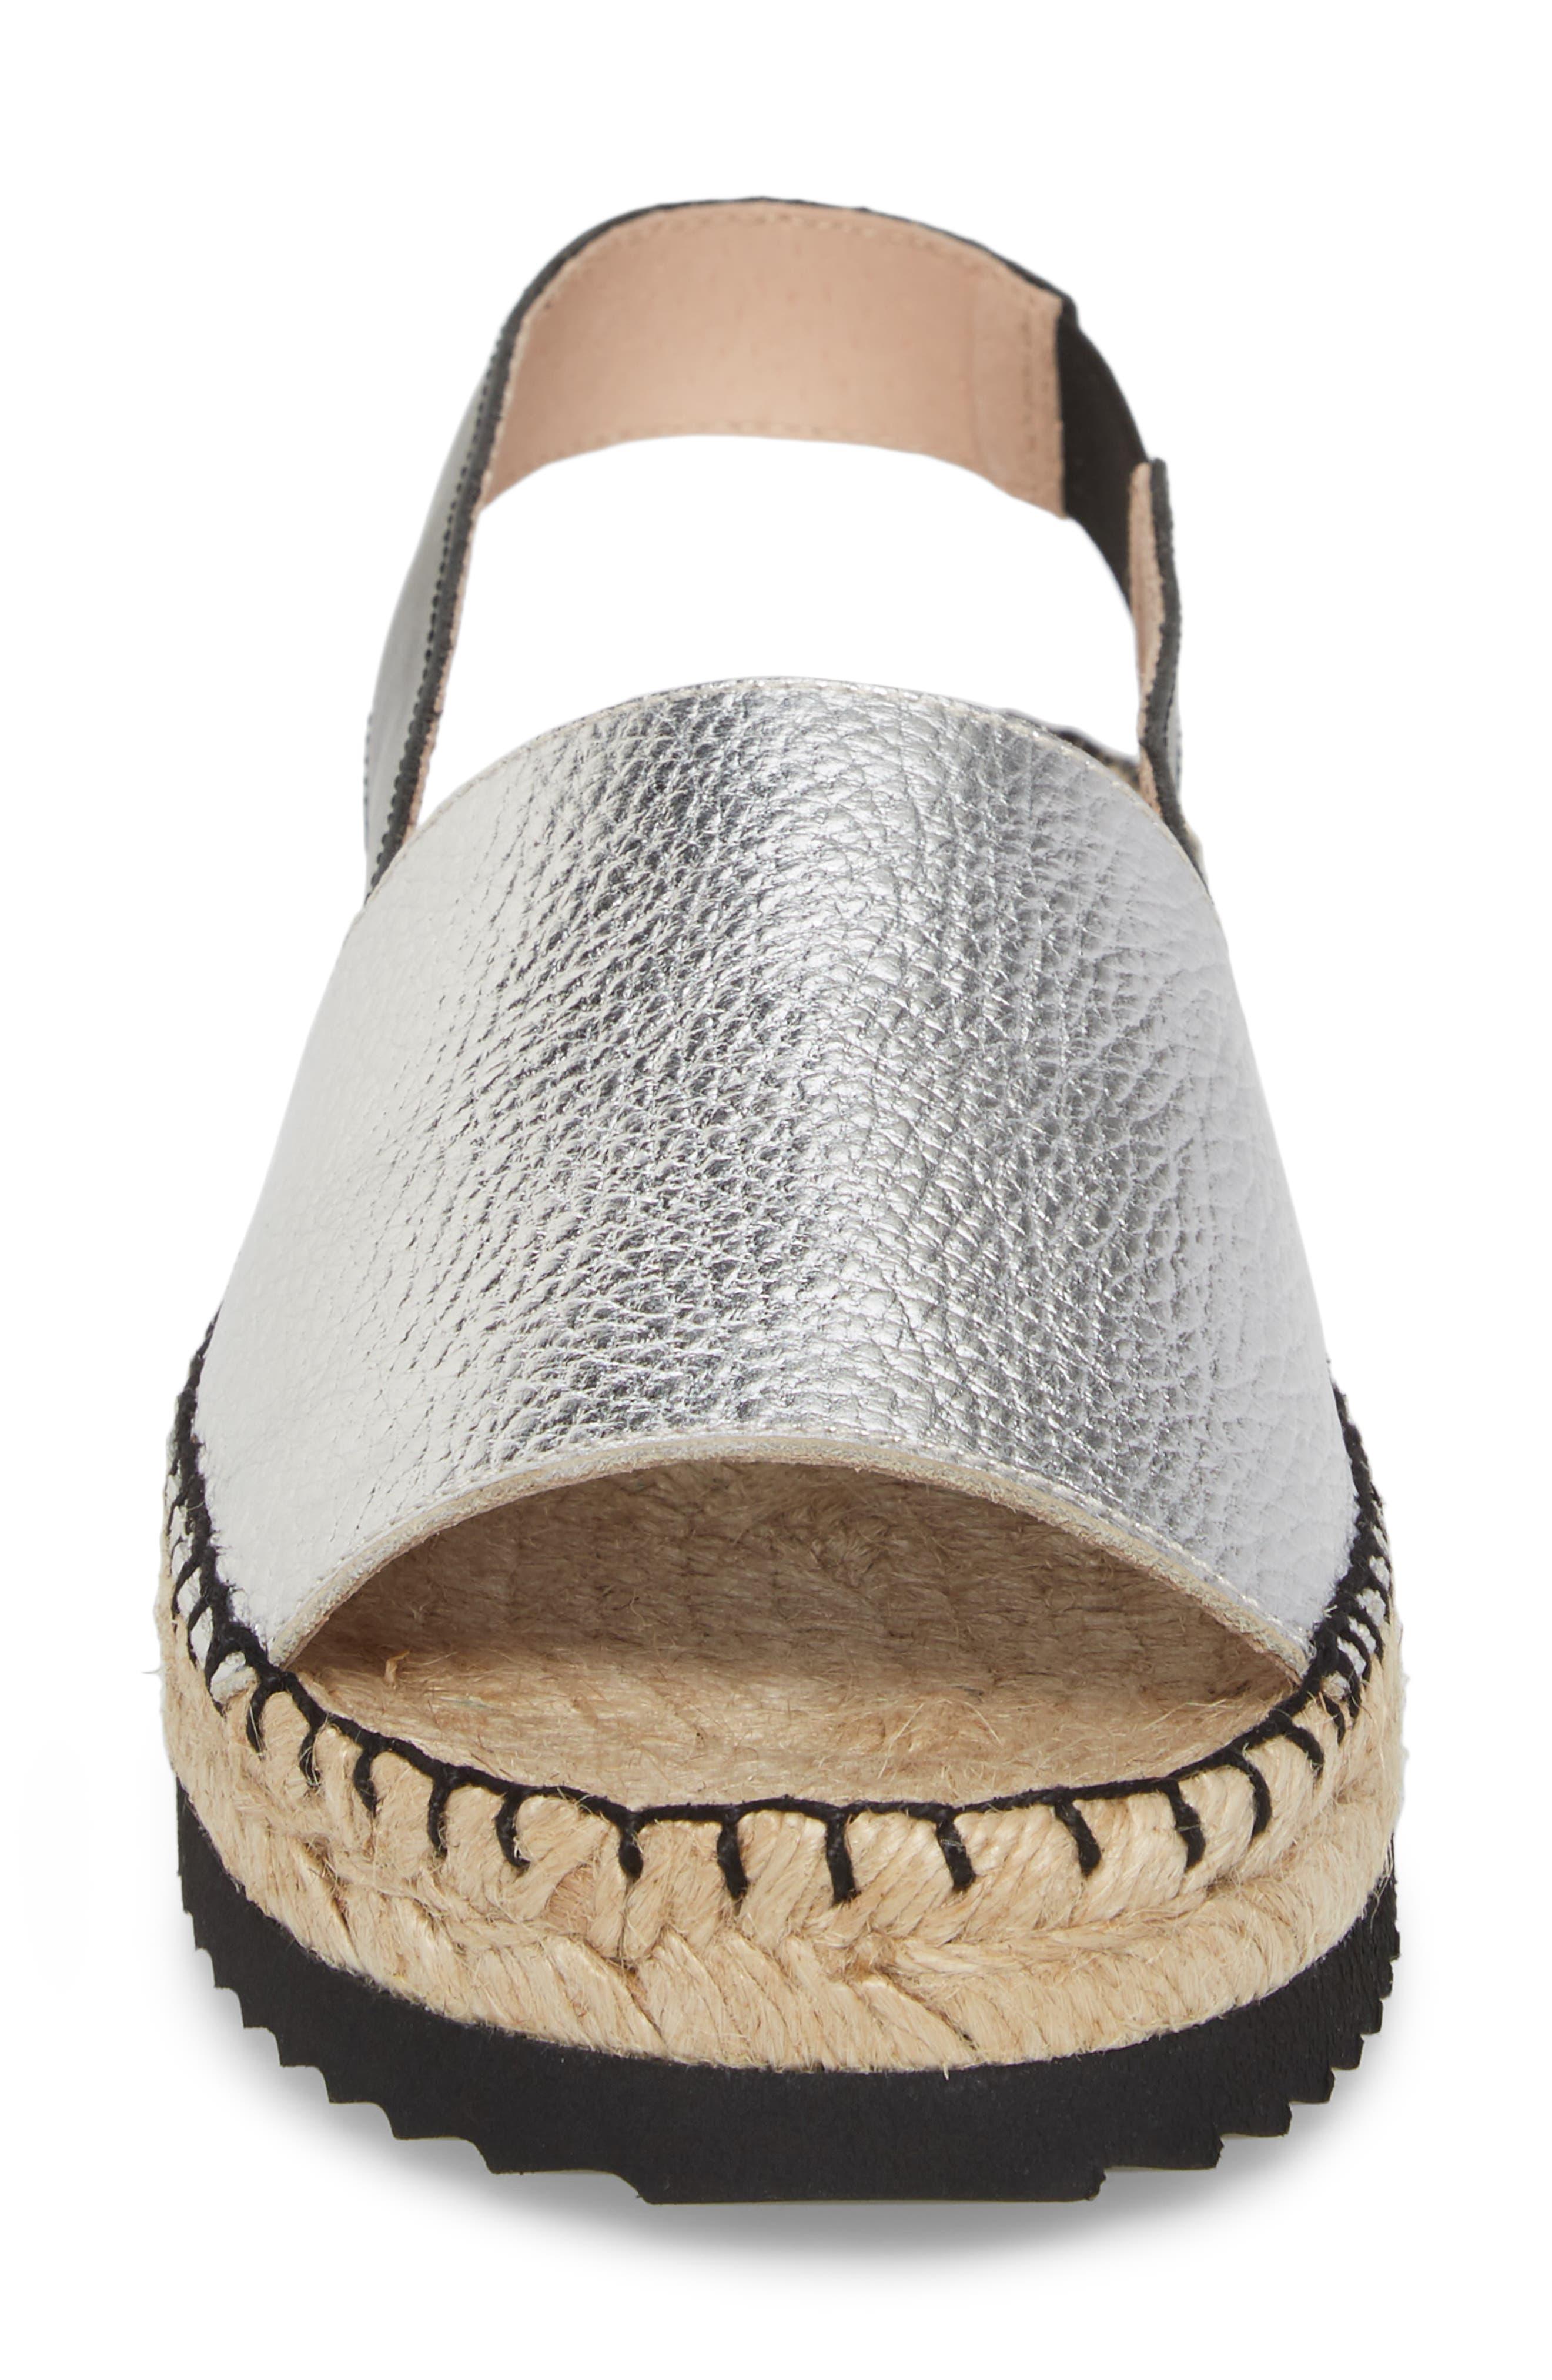 Soho Platform Espadrille Sandal,                             Alternate thumbnail 4, color,                             SILVER SUEDE